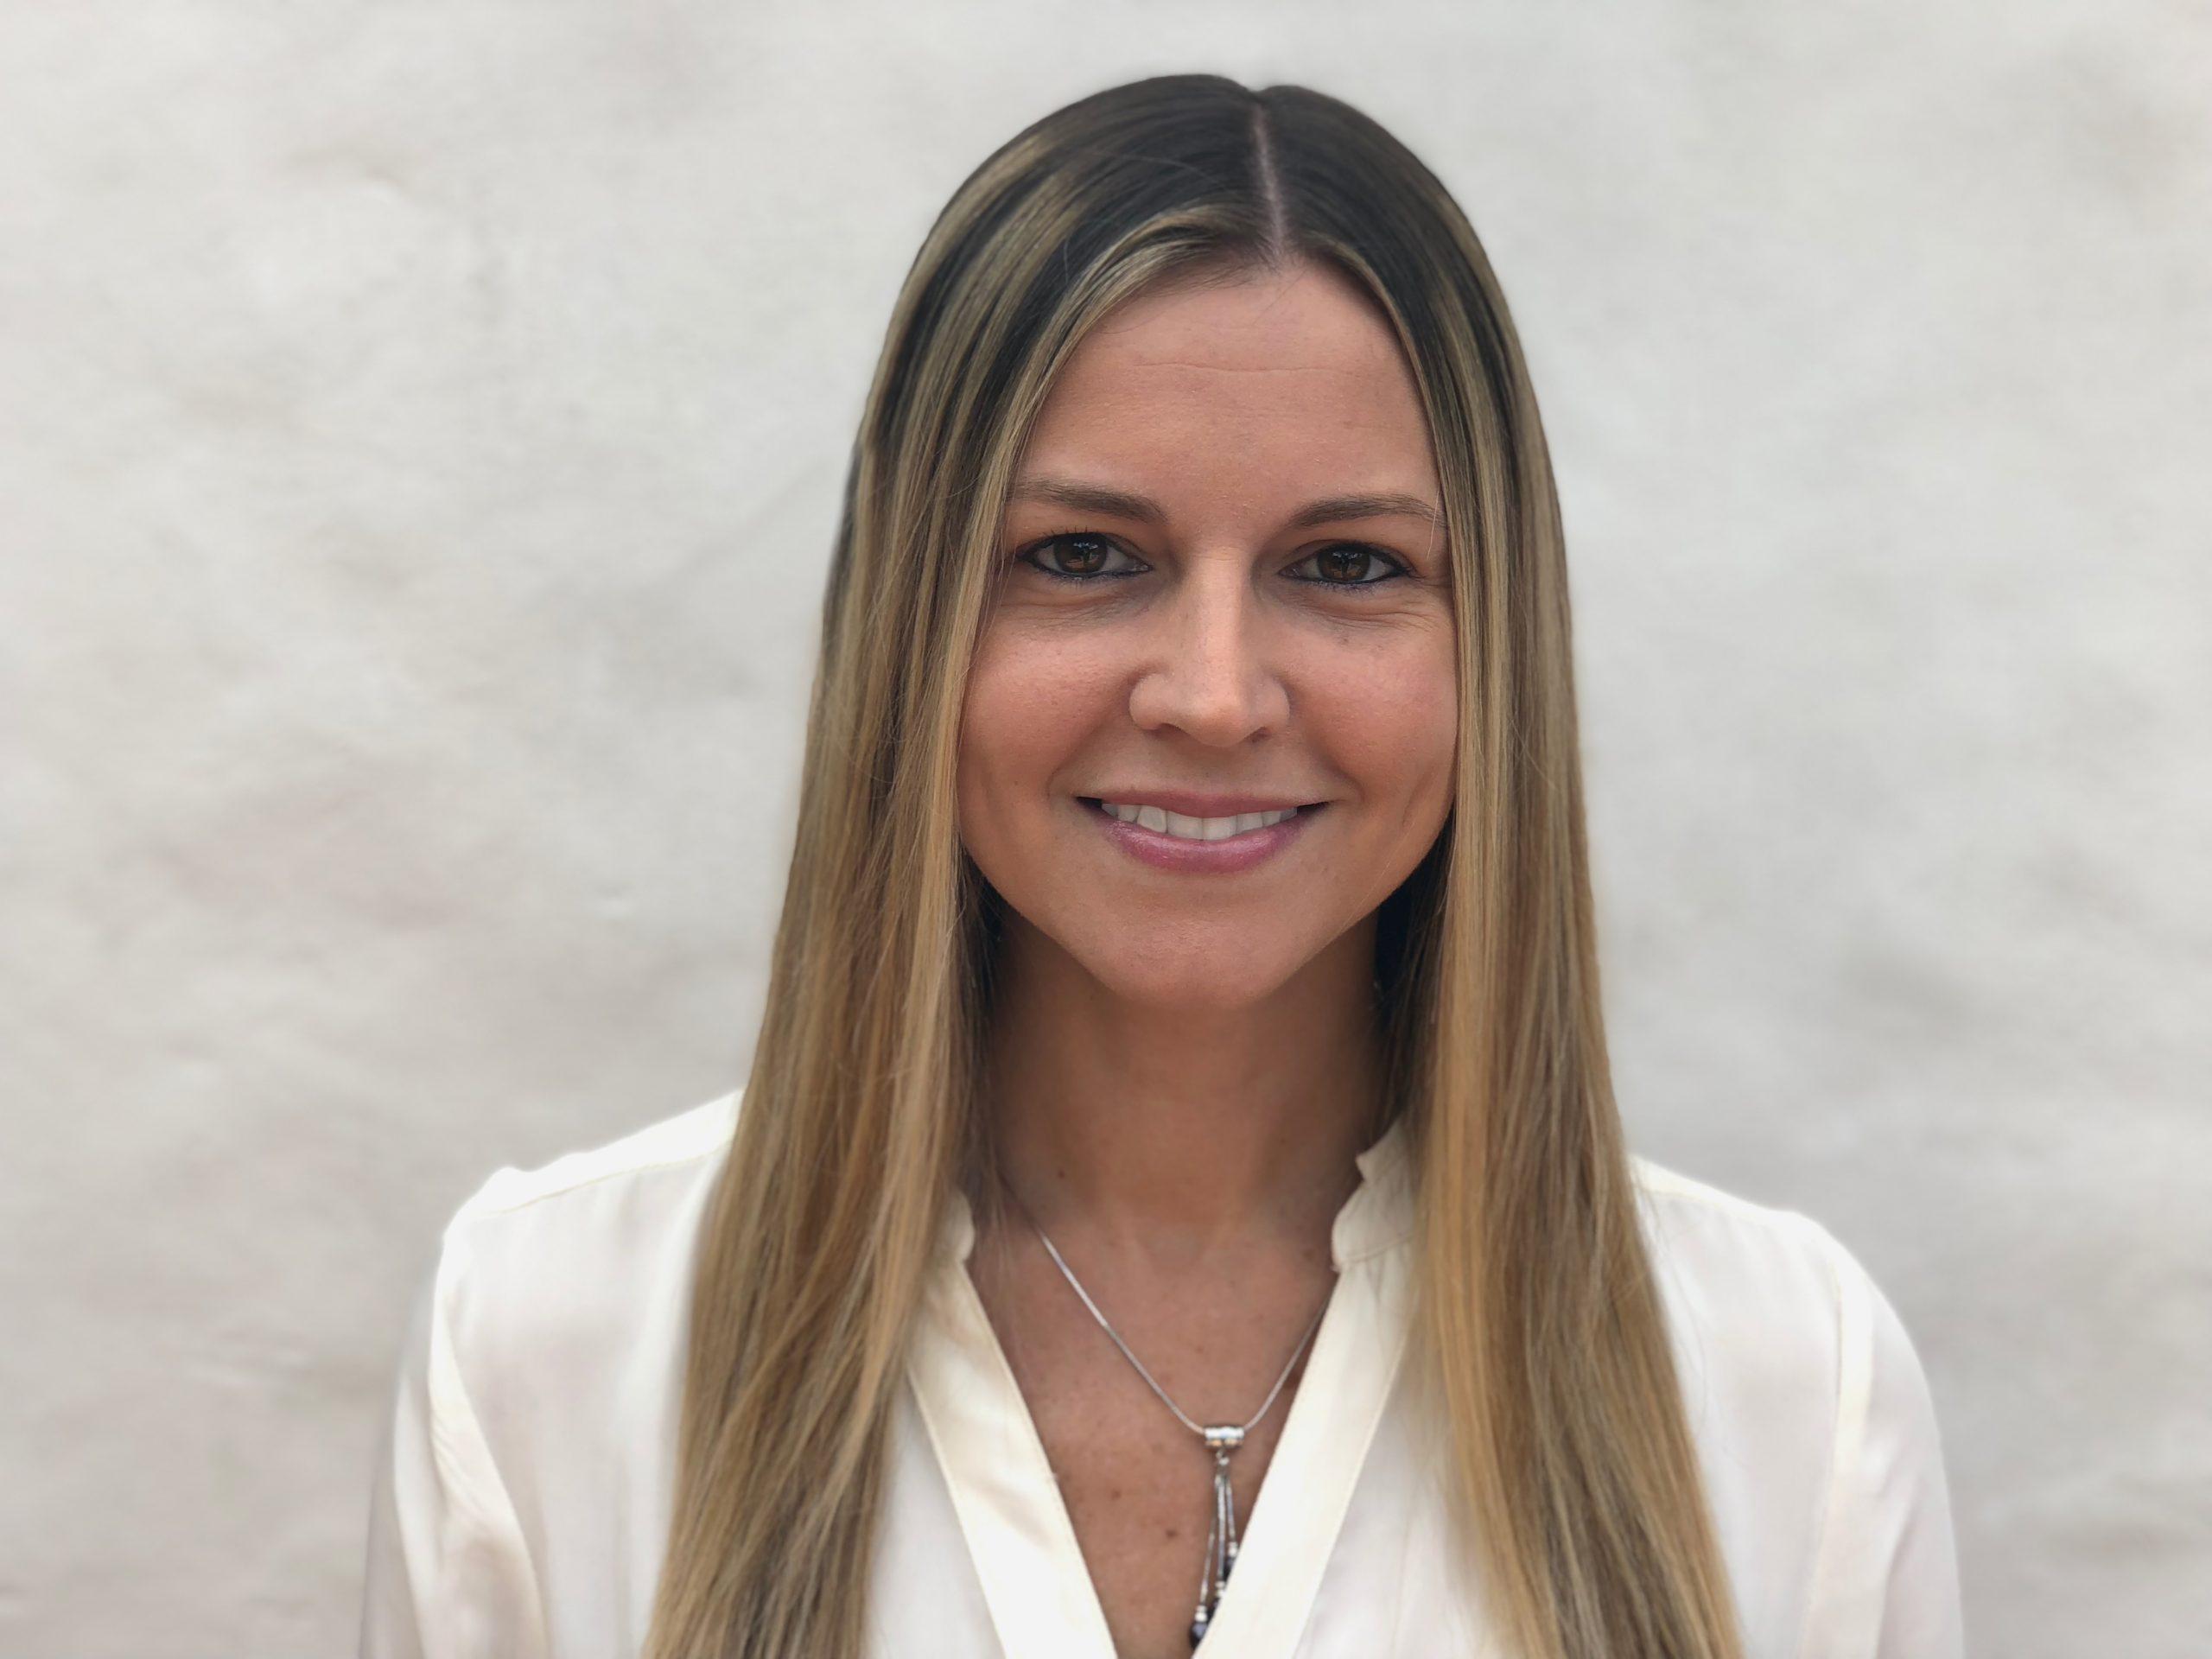 Sarah Hillyard